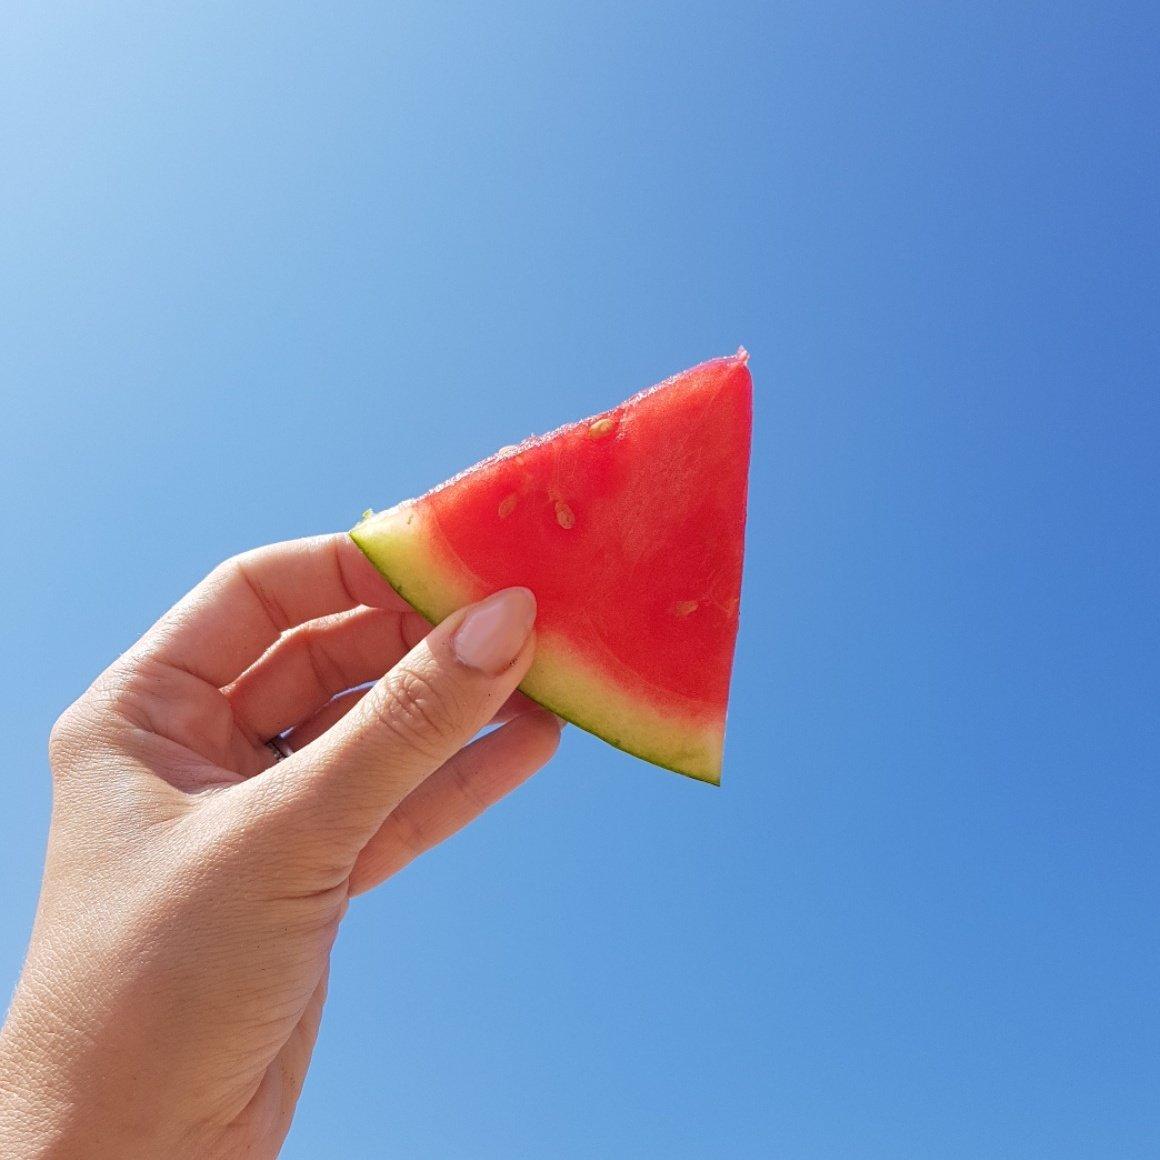 watermelon triangle against blue sky